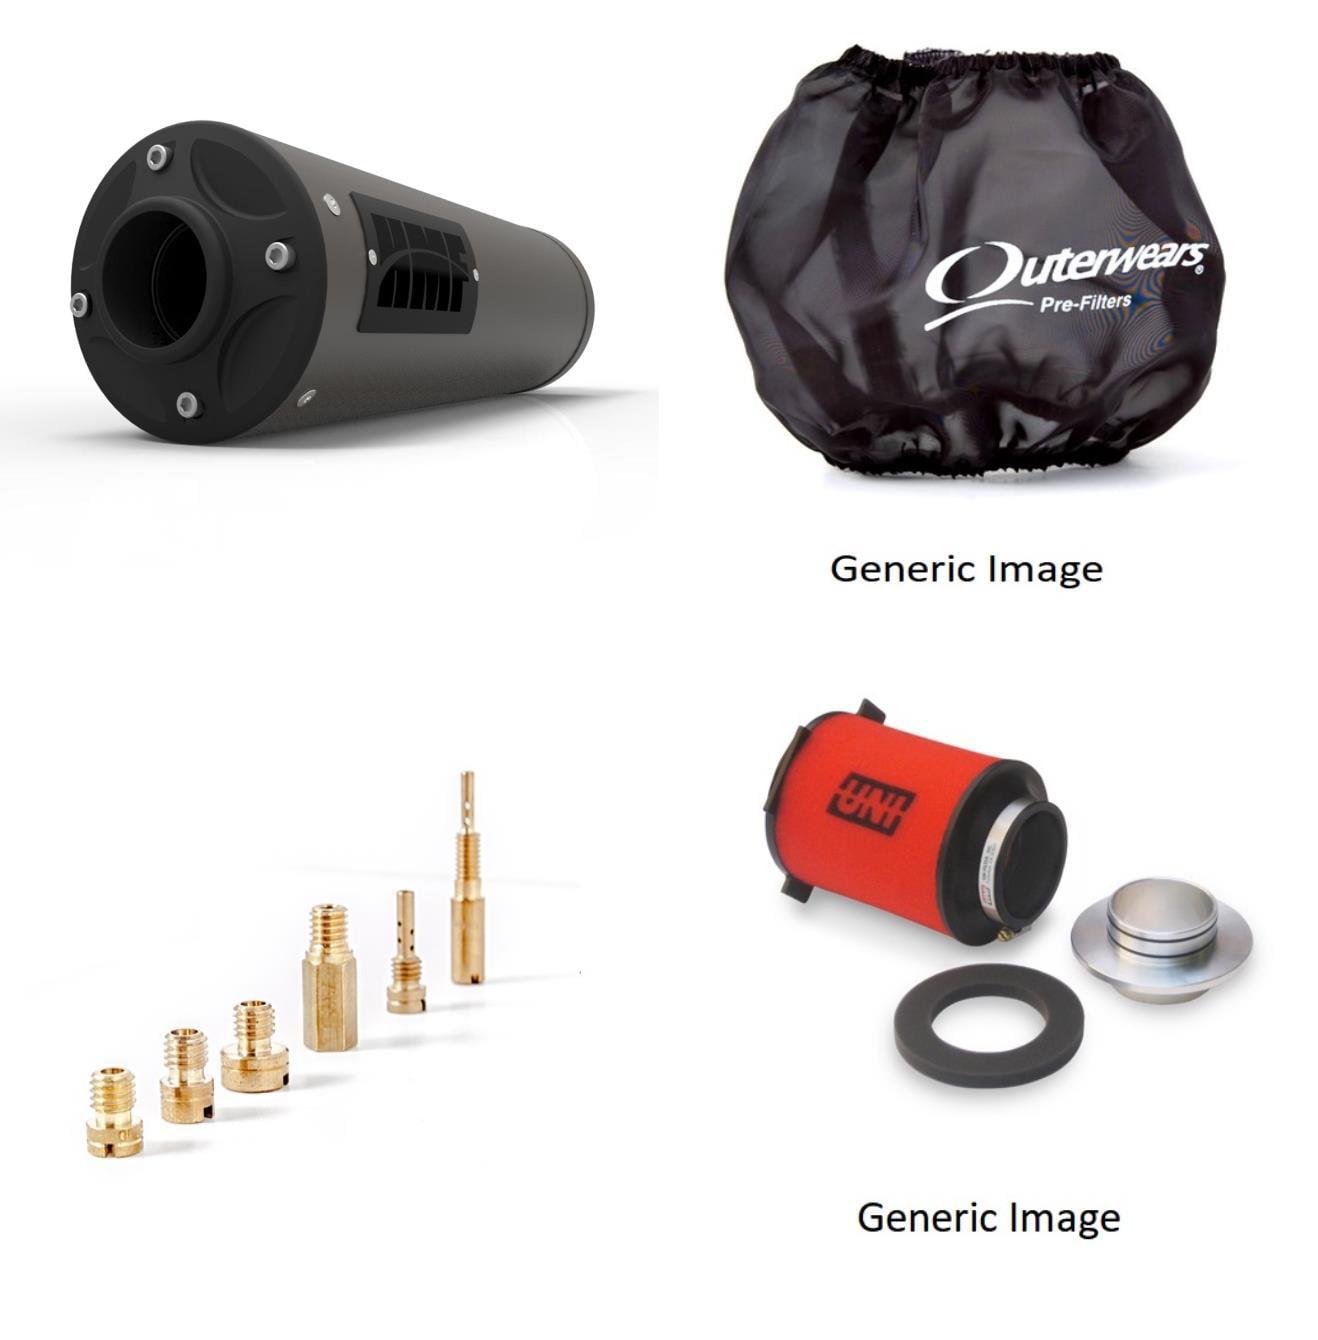 Basic Jet Kit, Pre Filter, Foam Air Filter & Blackout Titan-QS-Series Slip On Exhaust Billet for Kawasaki Teryx 2008